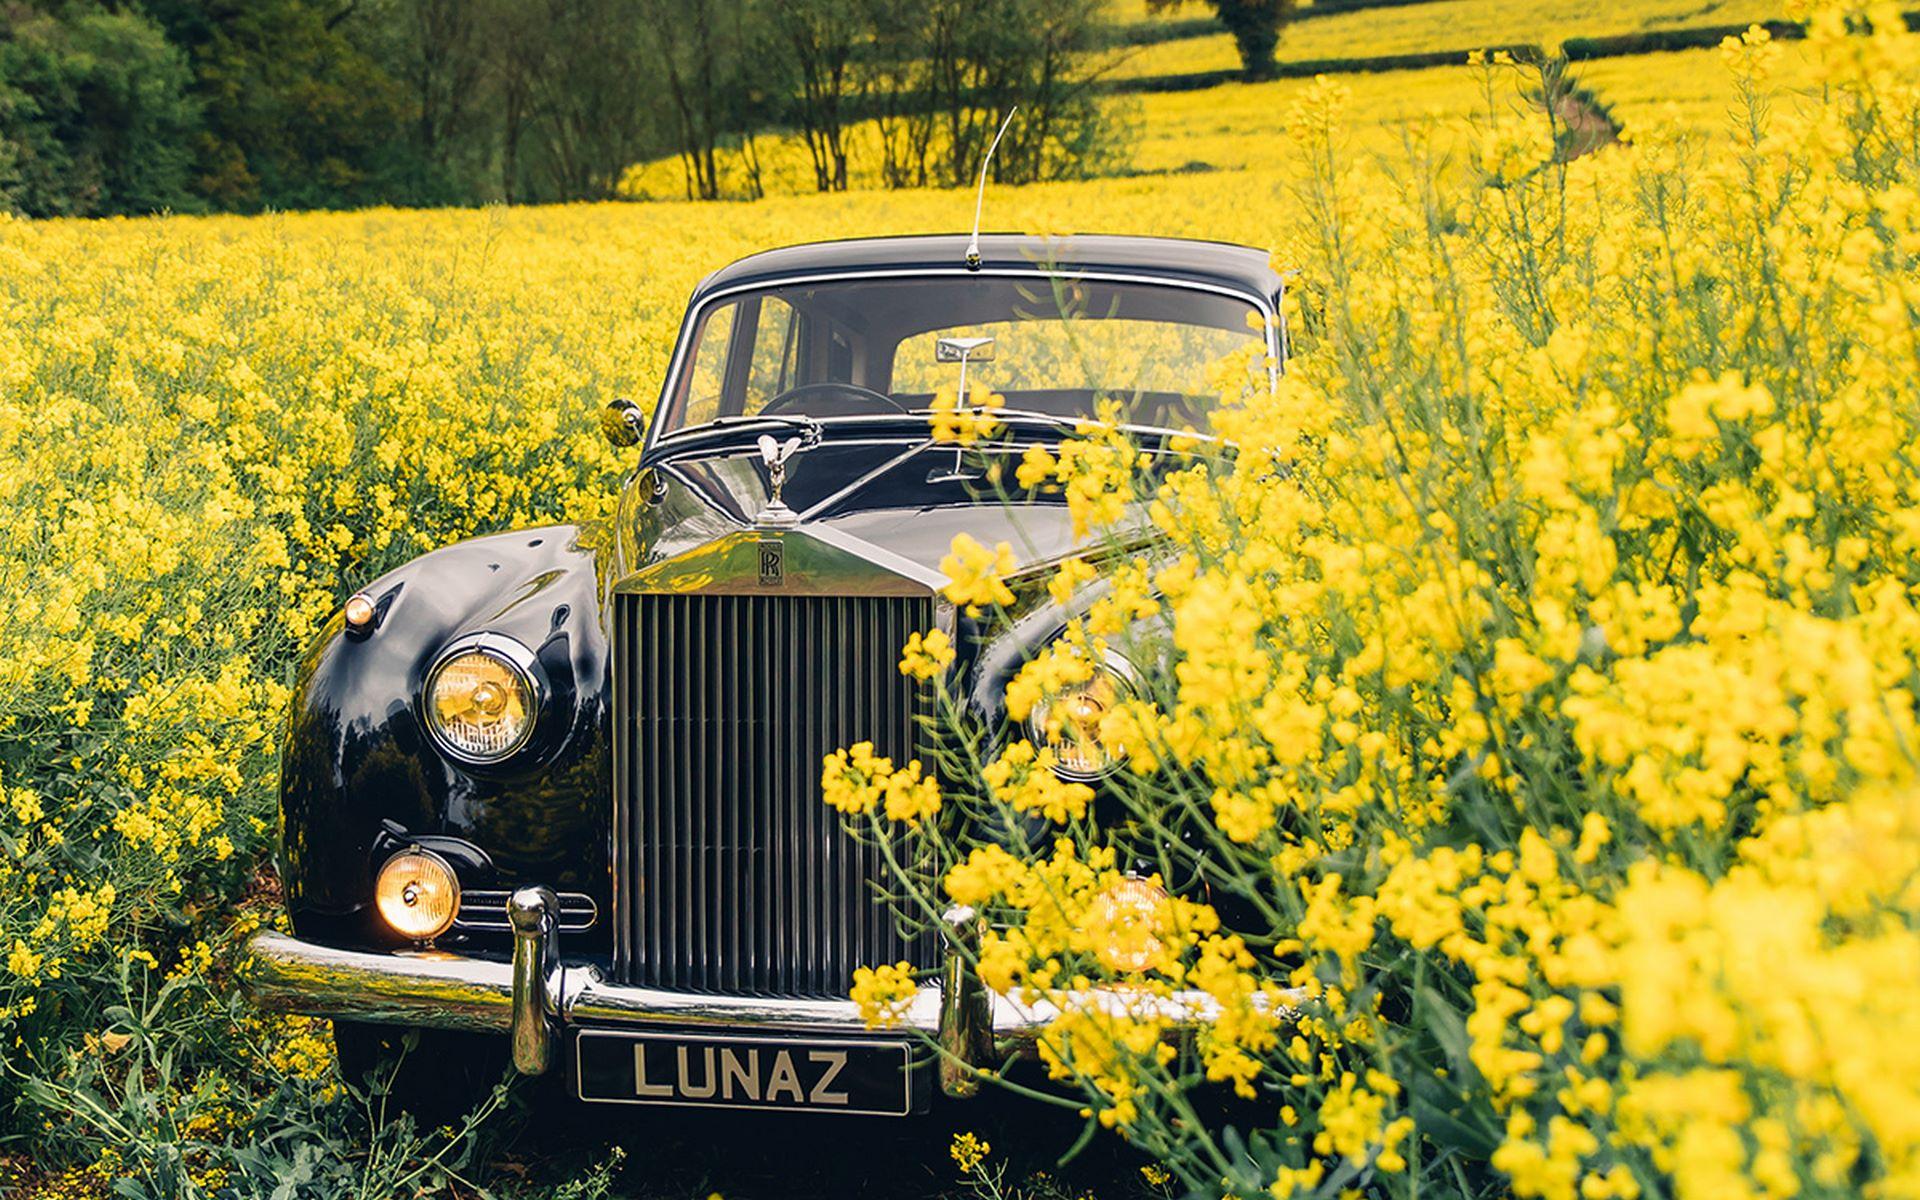 Electris-Rolls-Royce-Phantom-V-and-Silver-Cloud-by-Lunaz-12